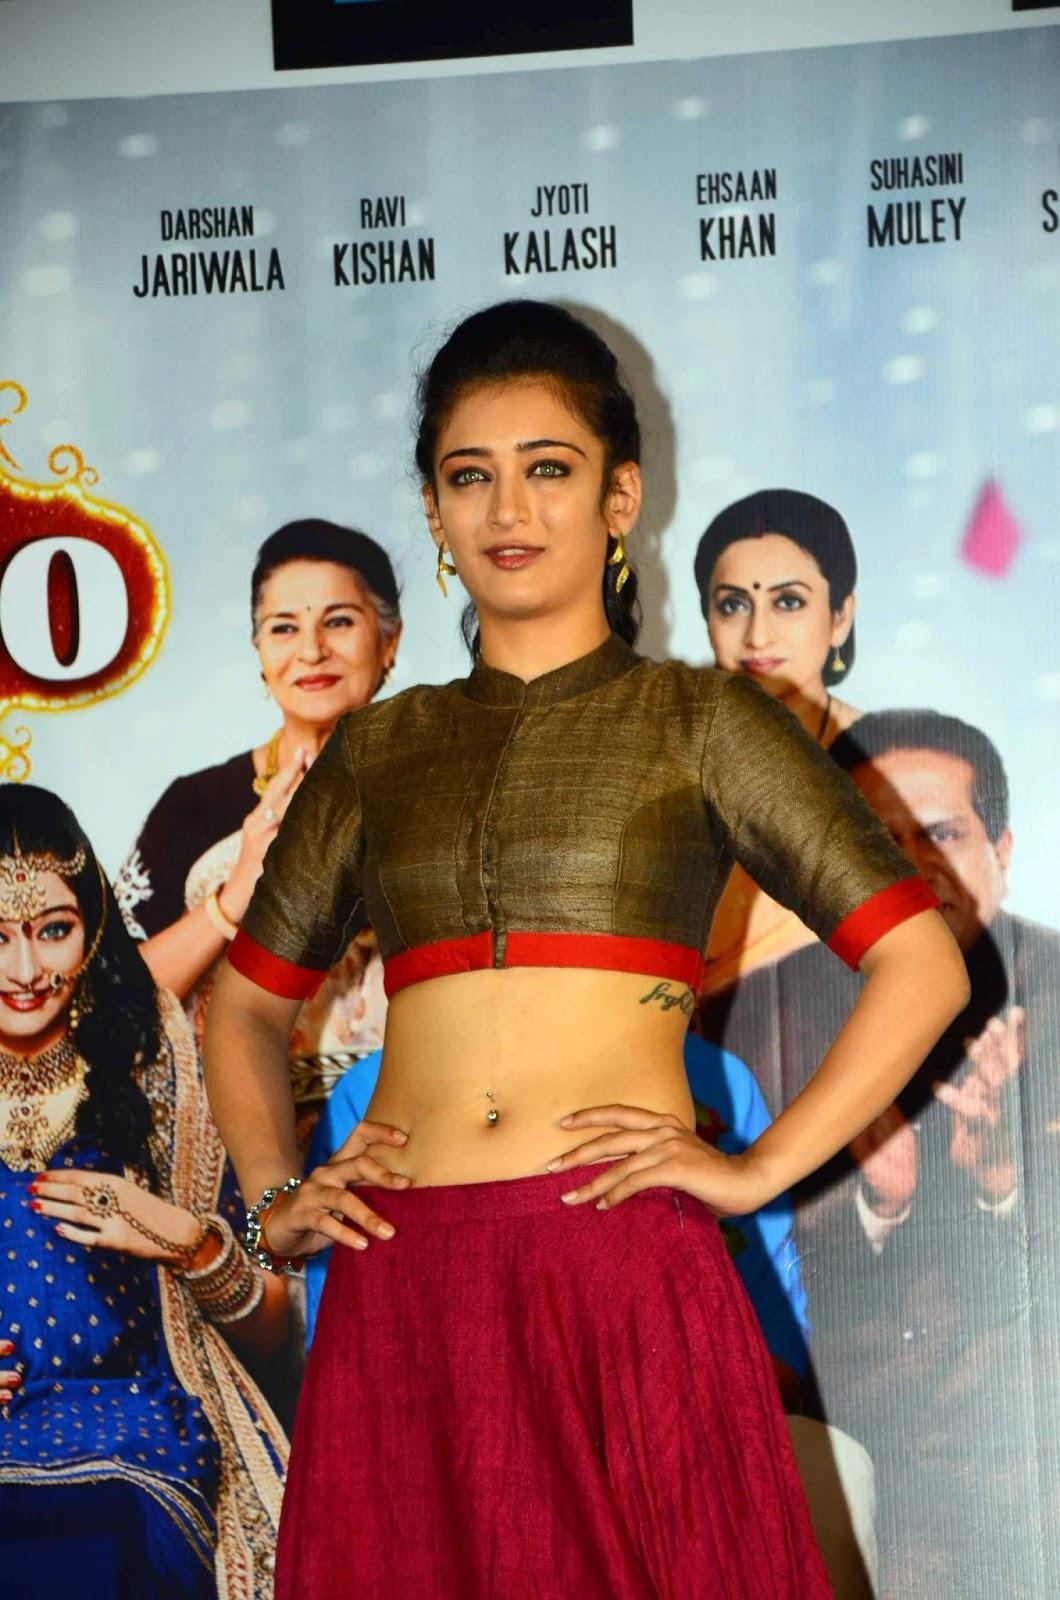 Akshara Haasan Showcasing Her Toned Midriff At Film Laali -2913